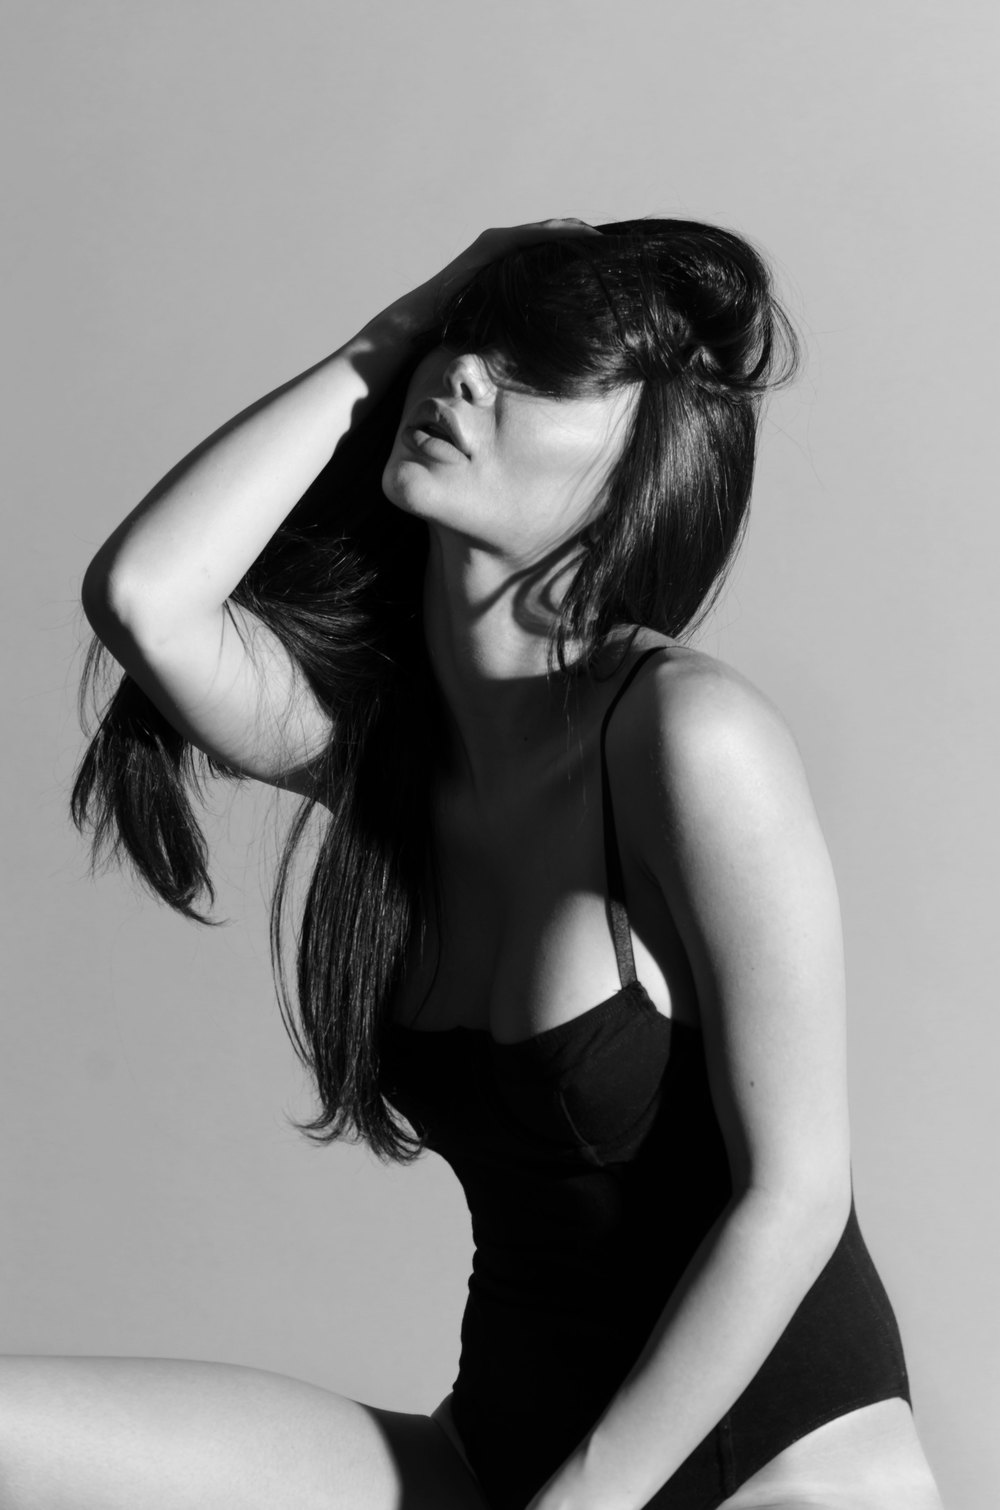 Jasmine-Studio-Grey-1-bw-casenruiz.jpg